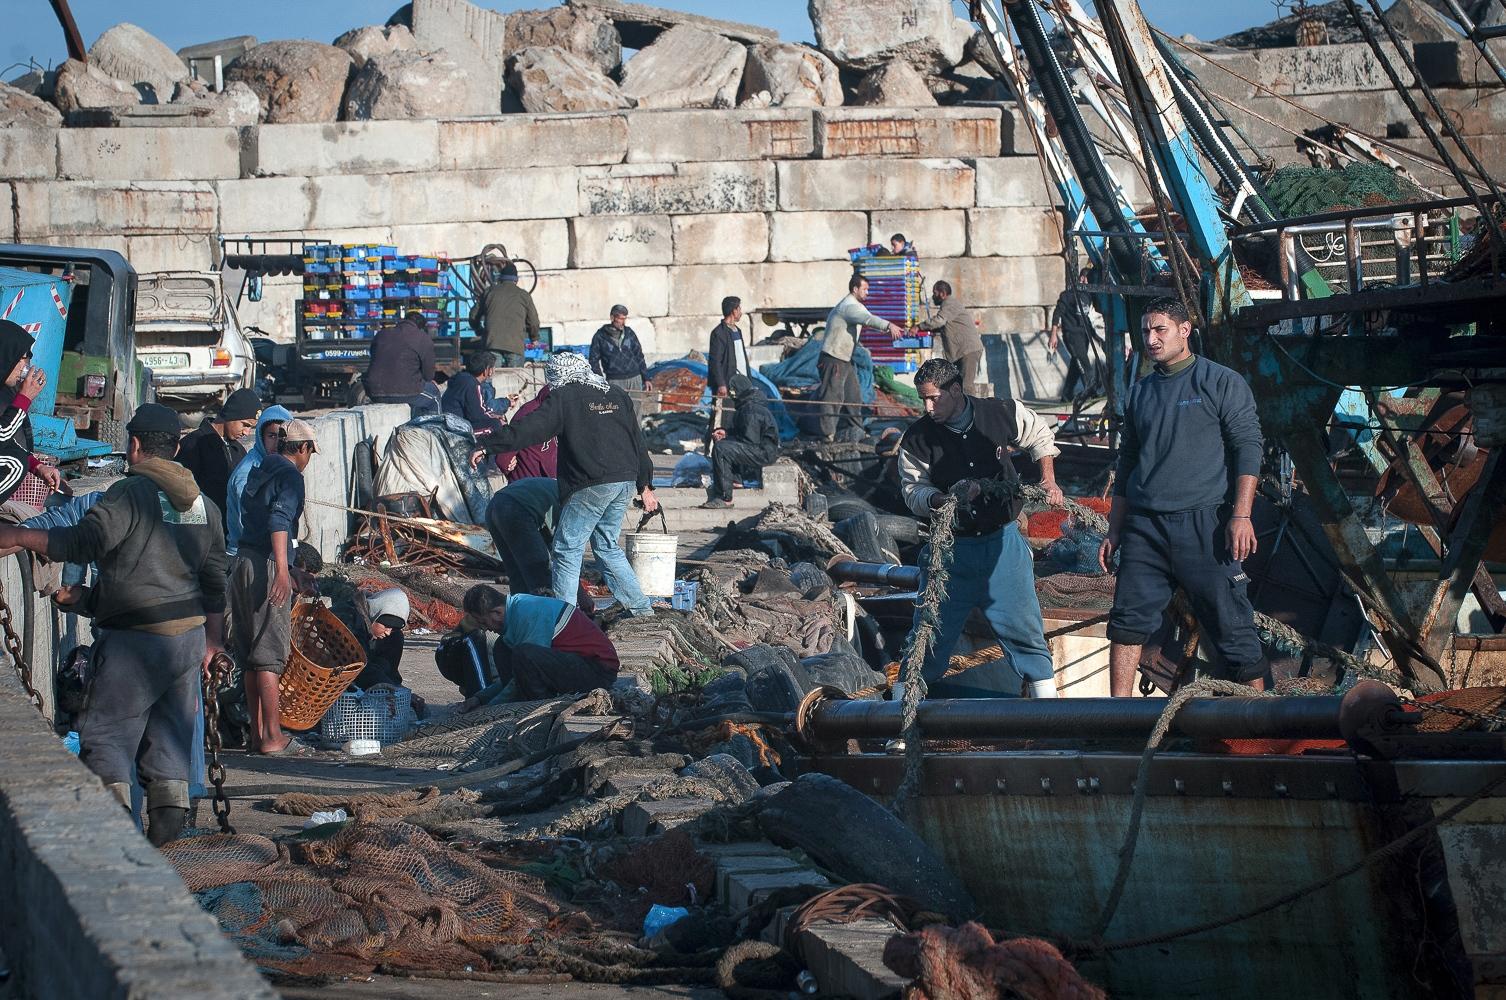 Fishermen making ready their boats. Early morning at Gaza sea port, Gaza City, Gaza Strip.